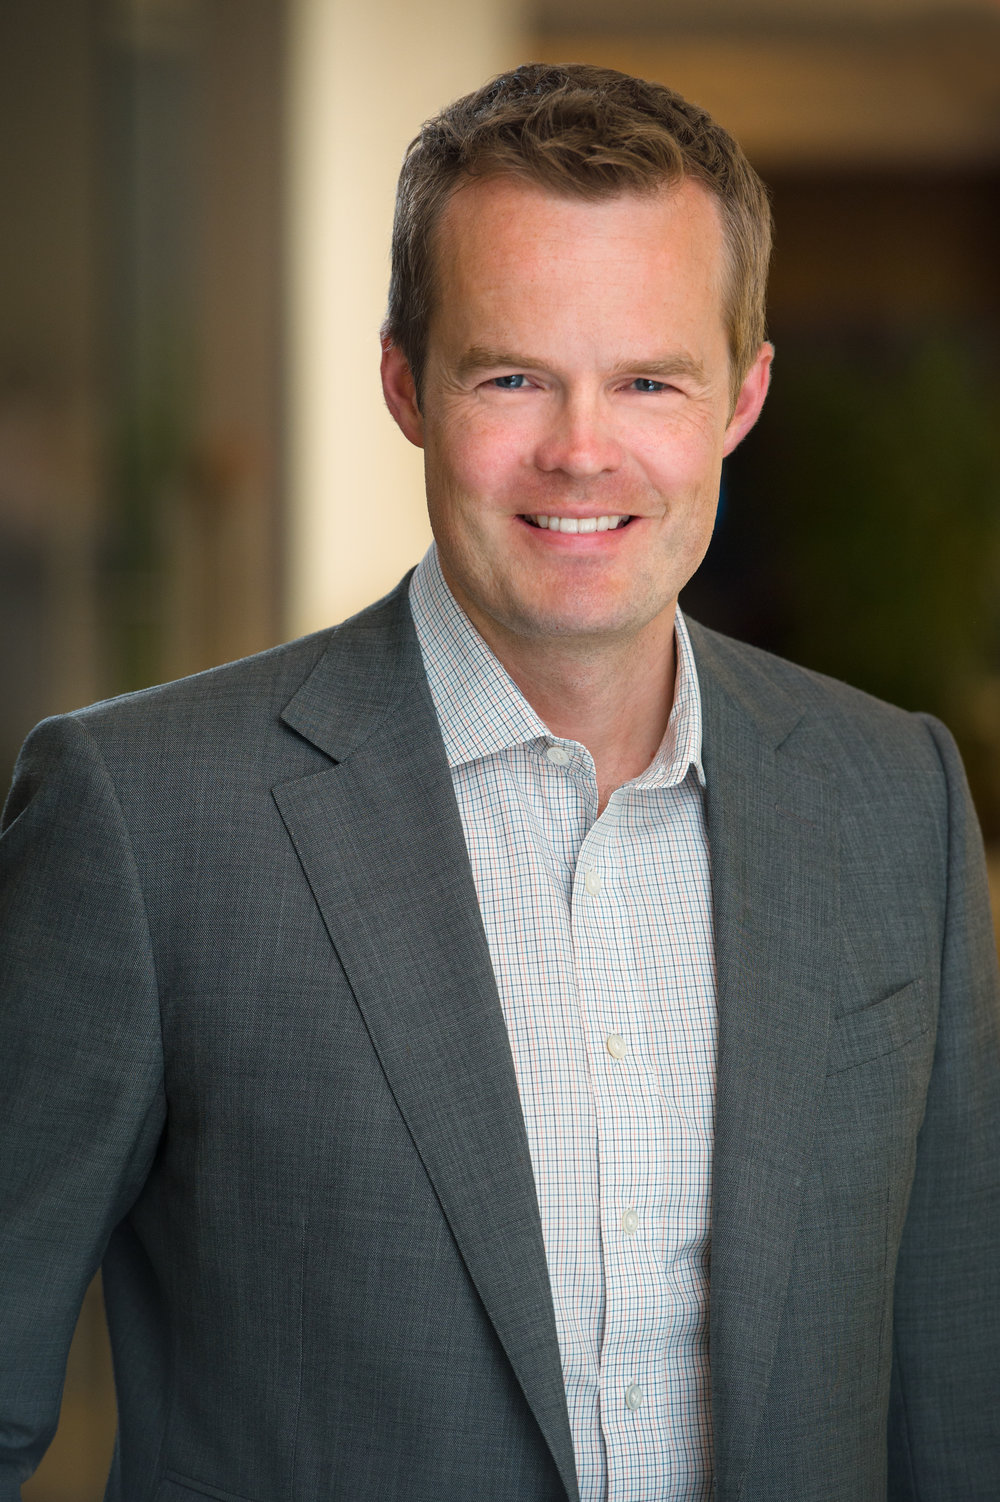 Jack Kokko, CEO of AlphaSense